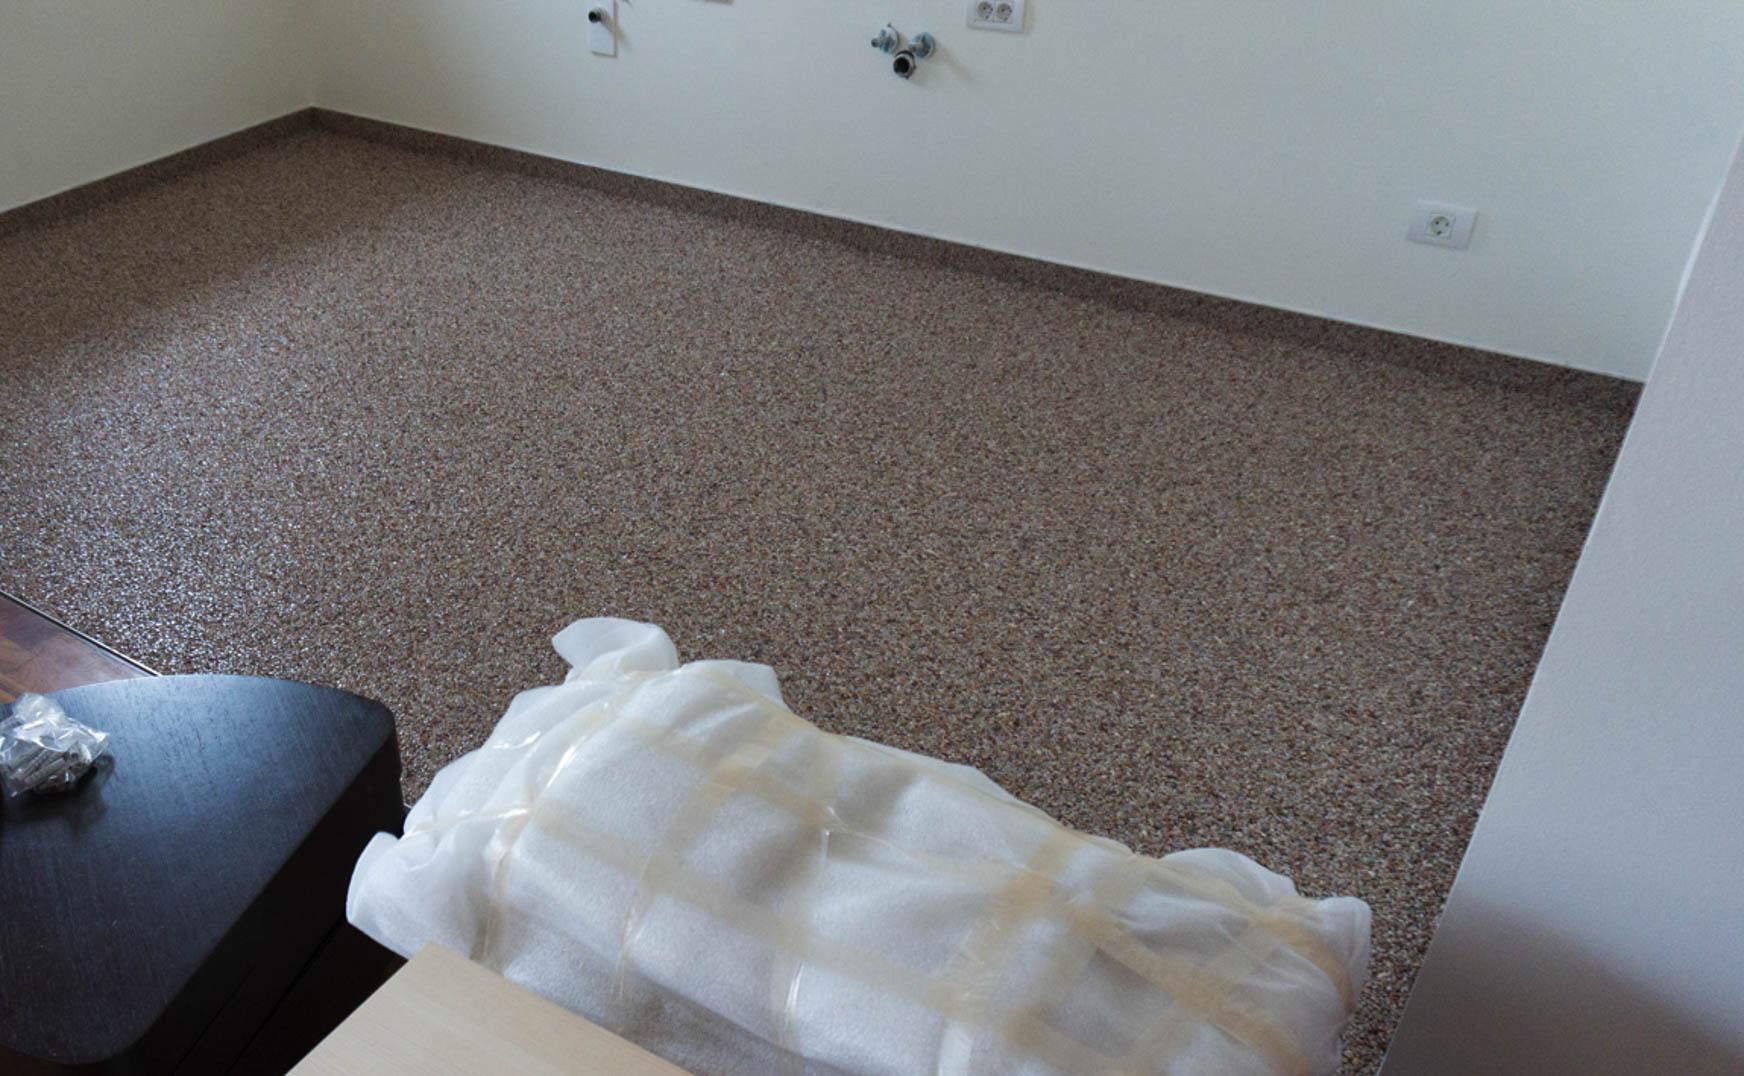 viarustik-stone-carpet-arabescato (2)